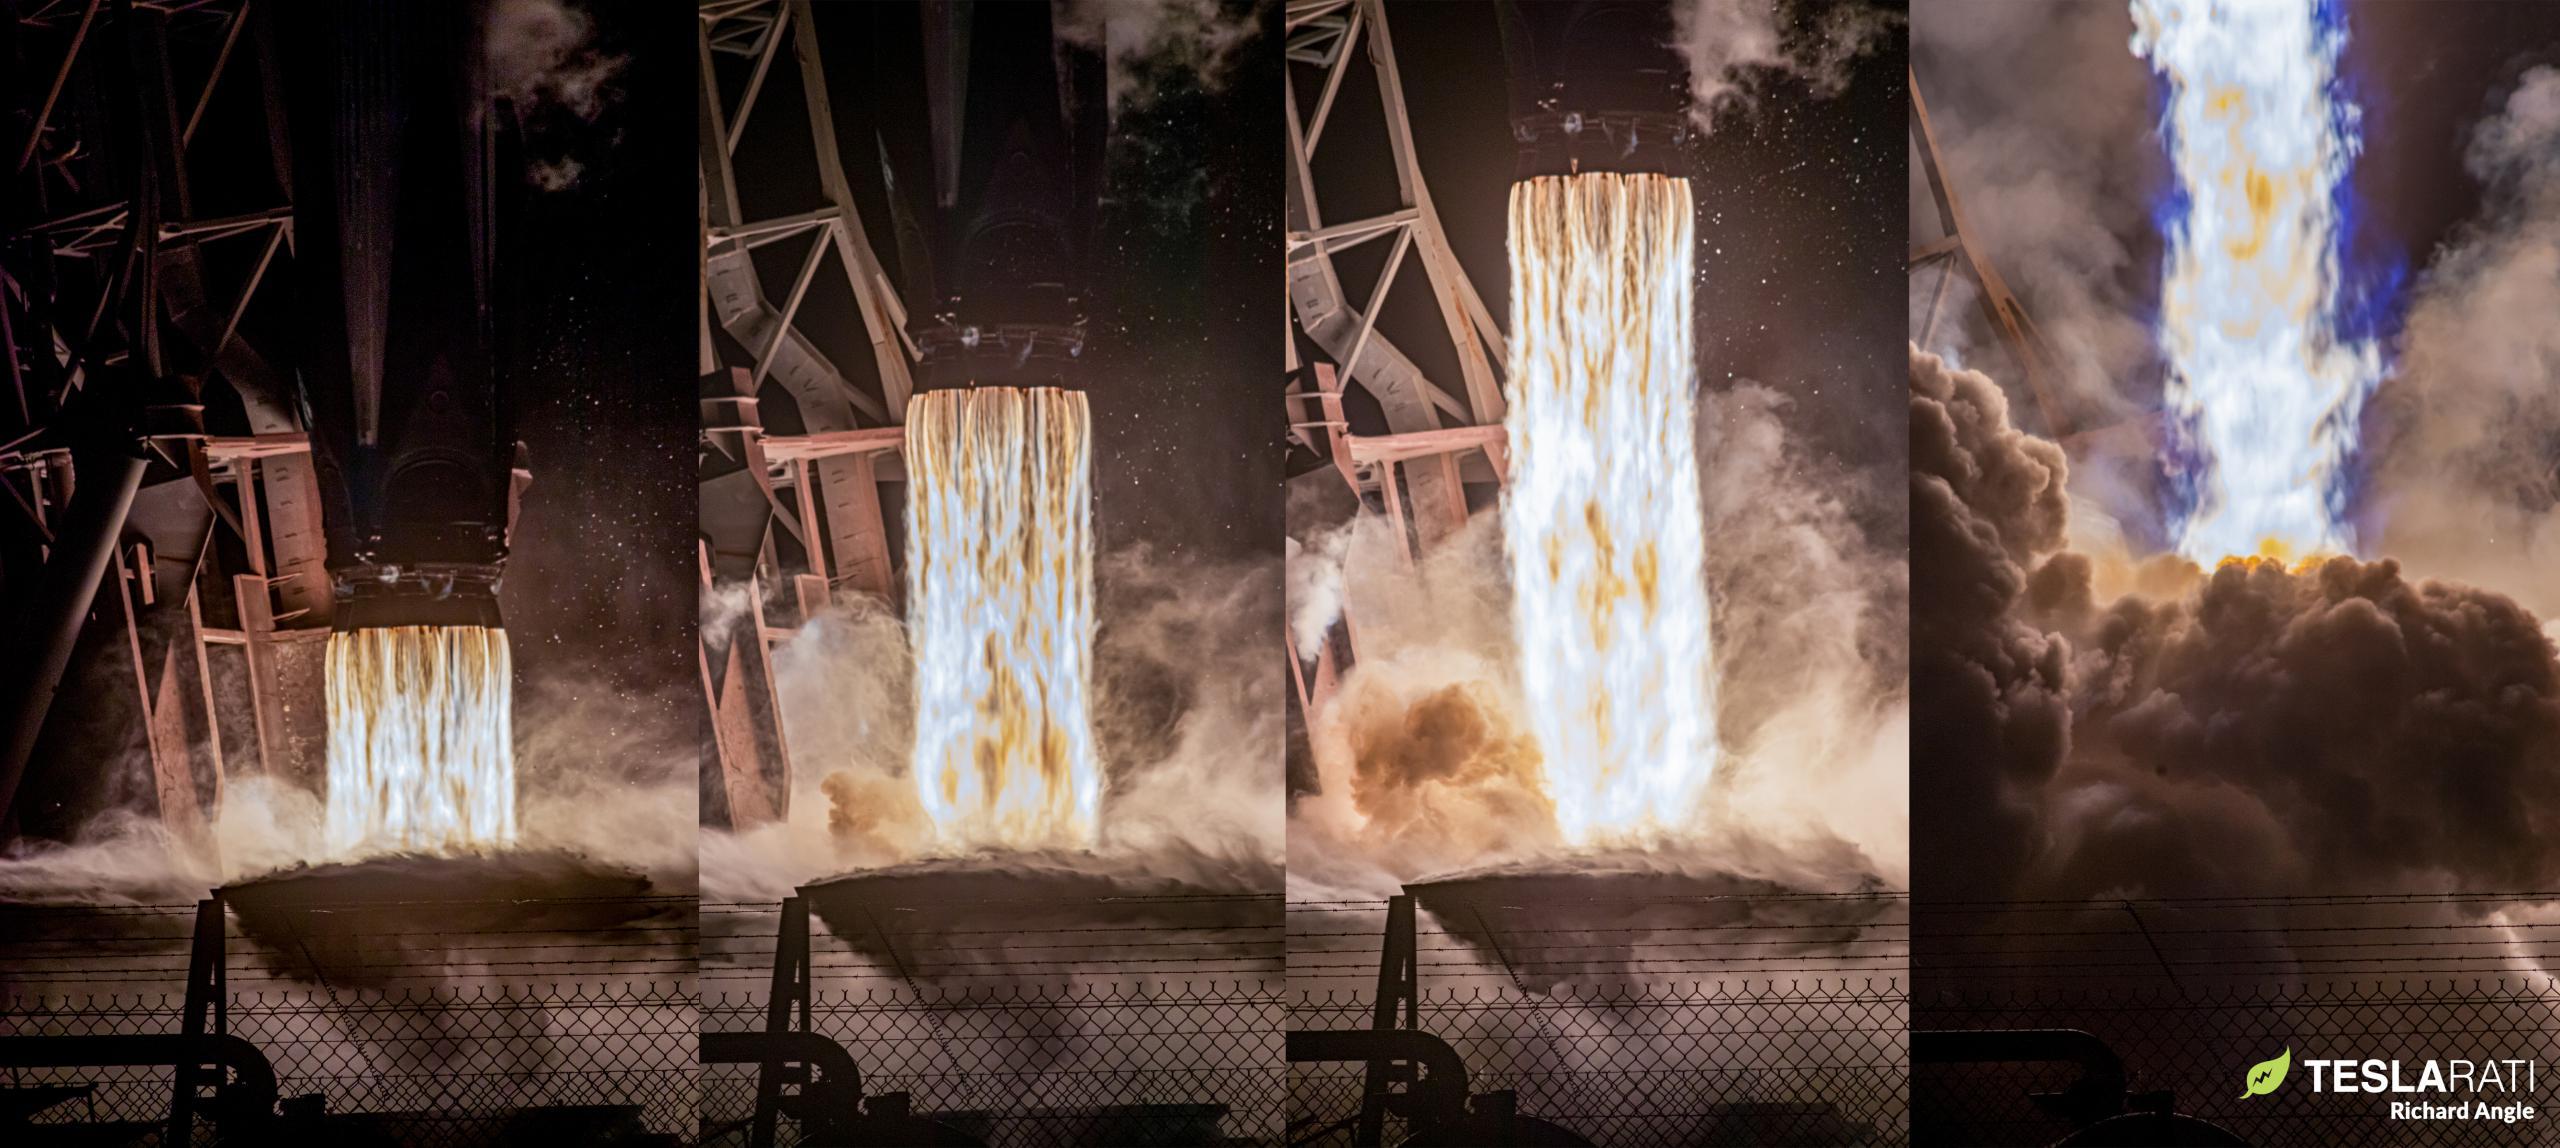 Starlink-27 Falcon 9 B1051 050921 (Richard Angle) launch wide (c)